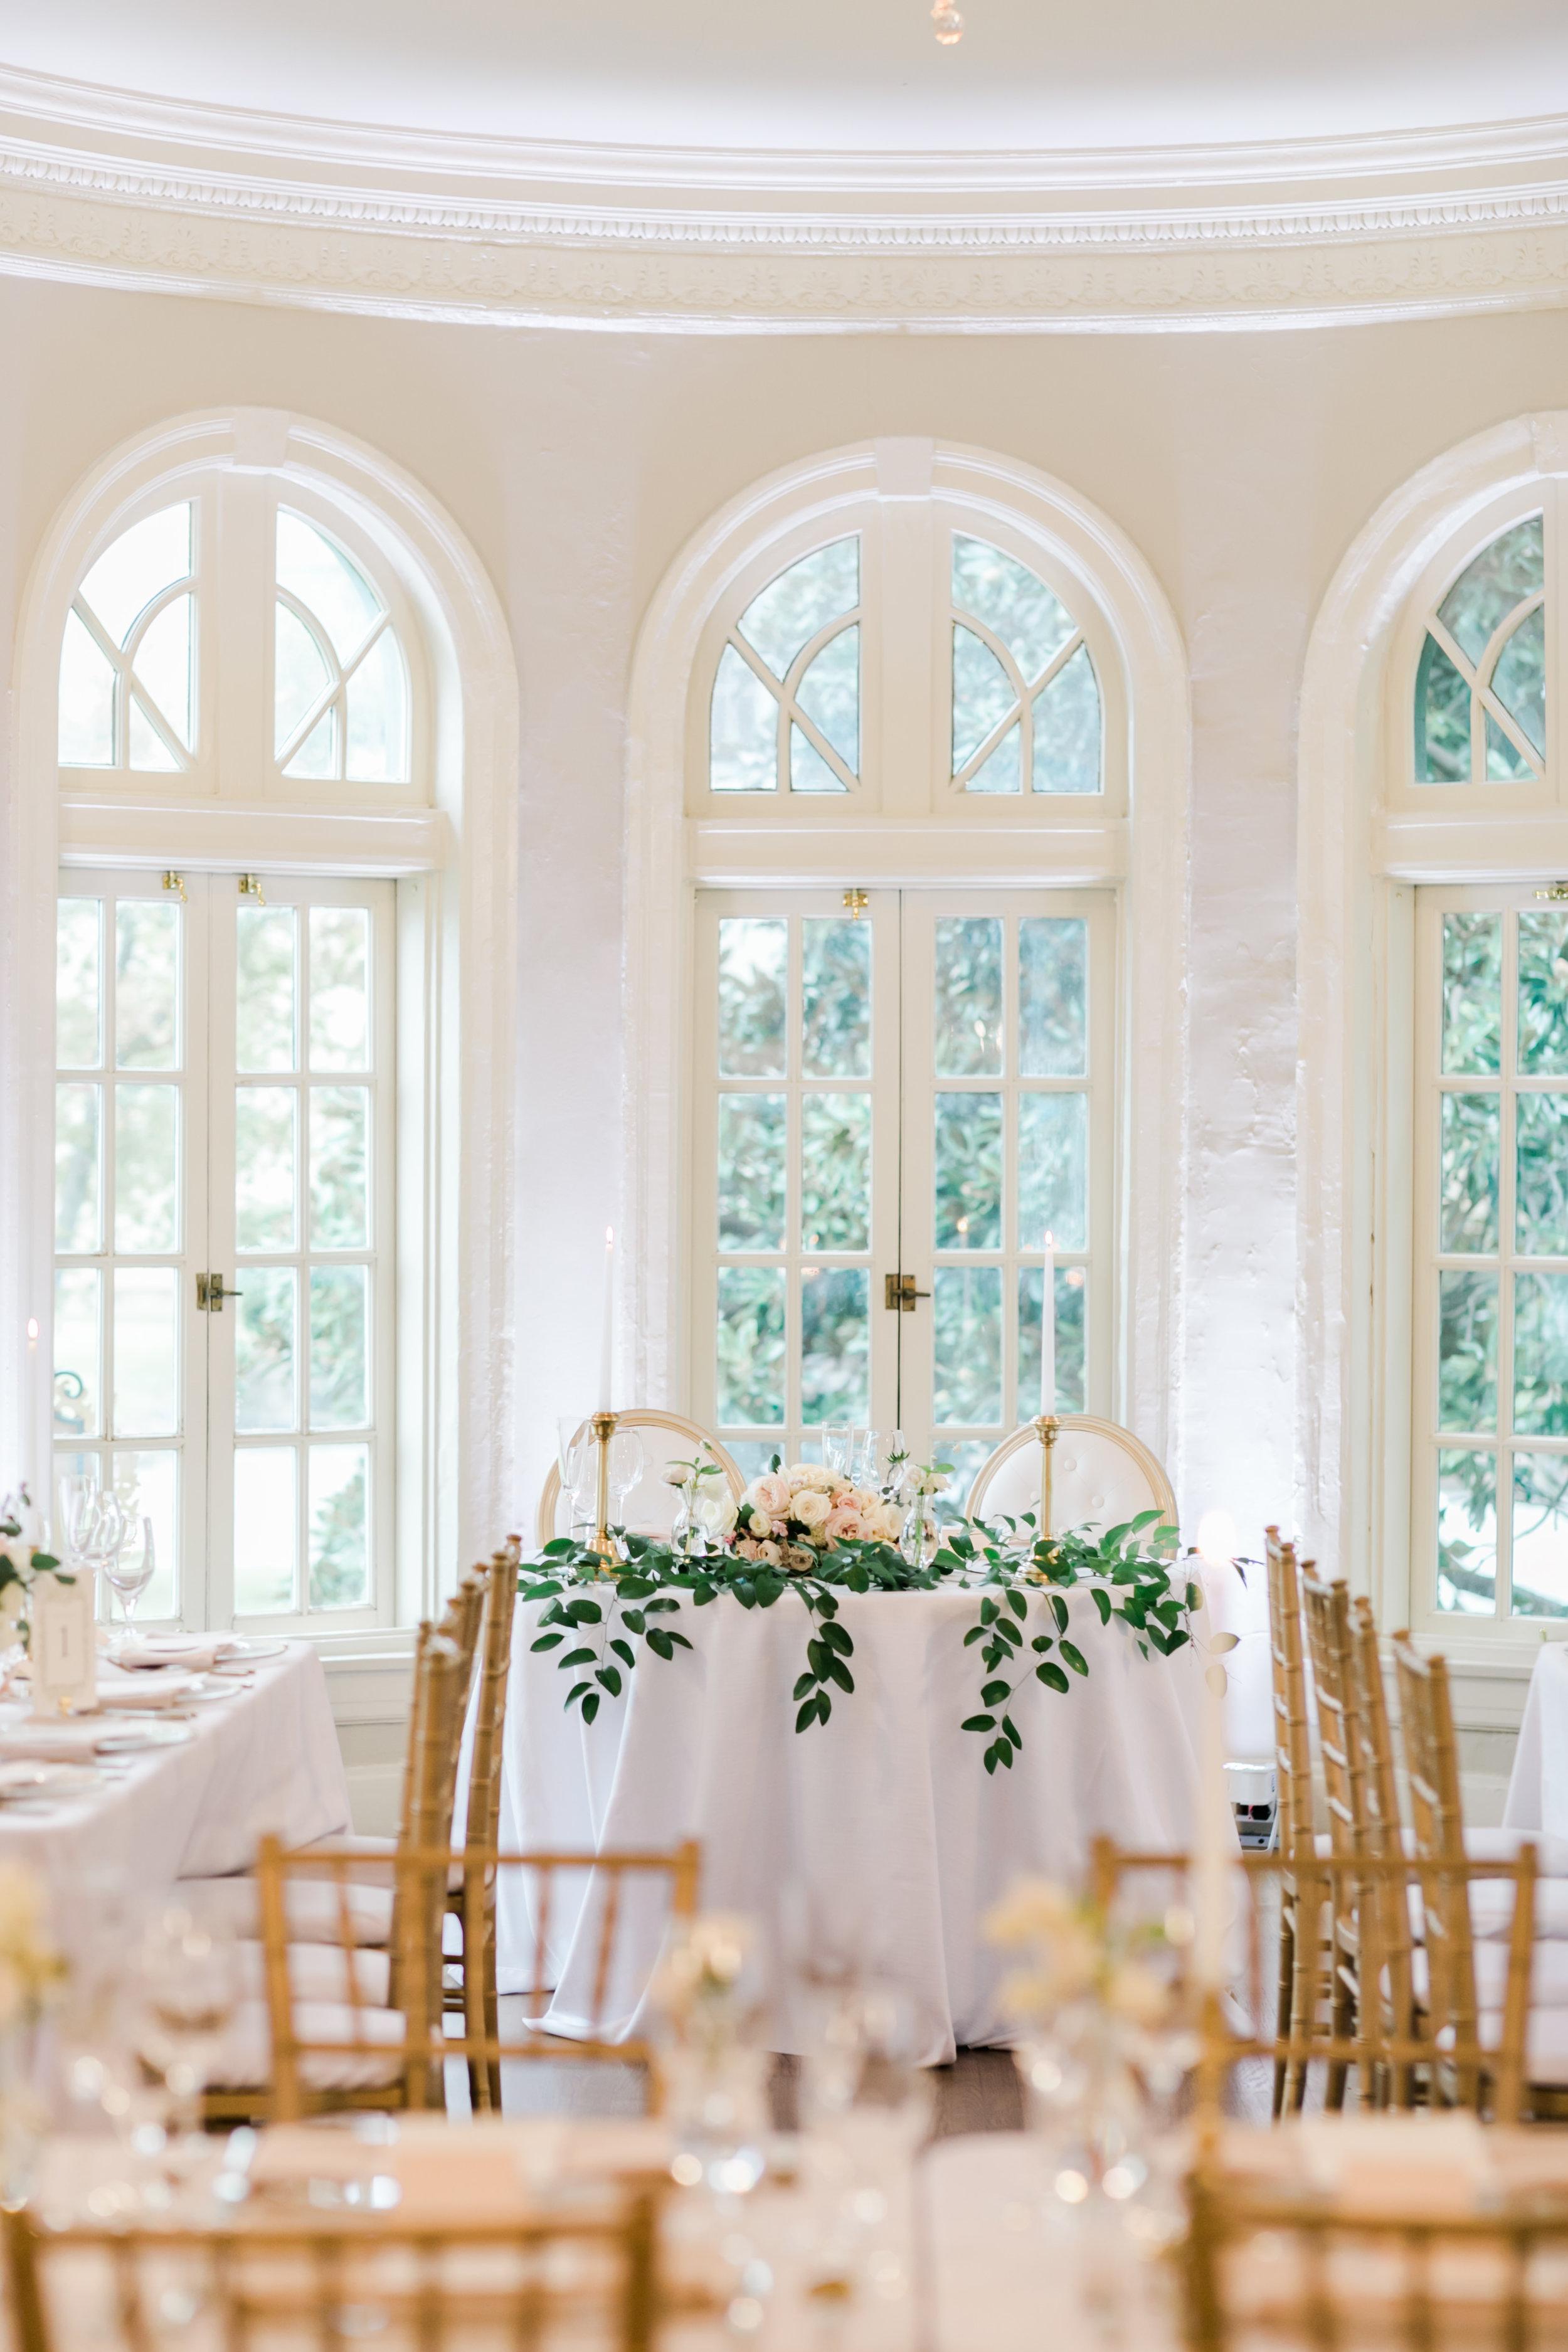 The Mansion at Woodward Park Tulsa Oklahoma Wedding_Valorie Darling Photography-9948.jpg